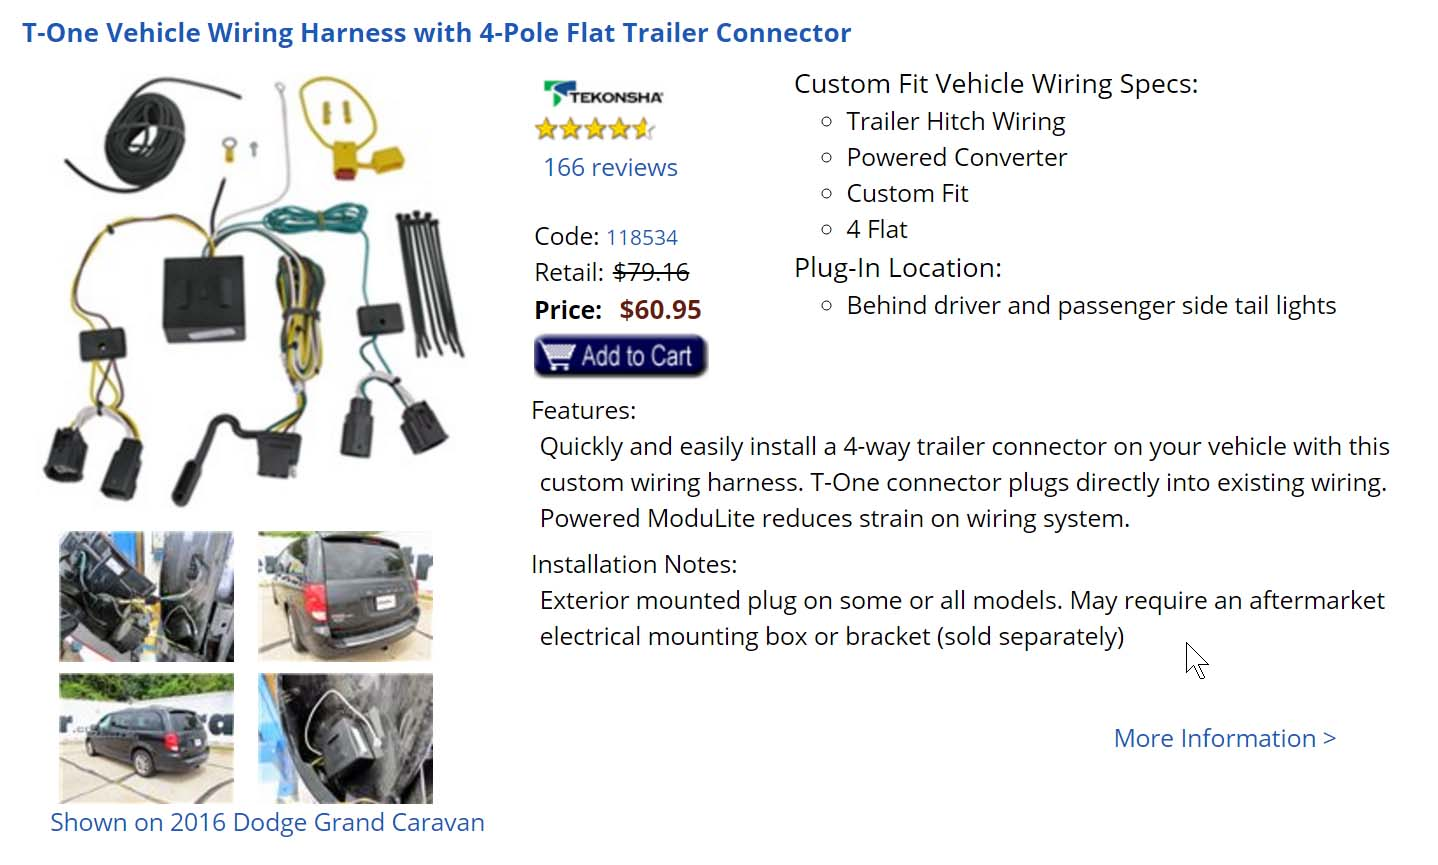 caravan internal wiring diagram jeep wrangler 2016 dodge grand trailer harness 47